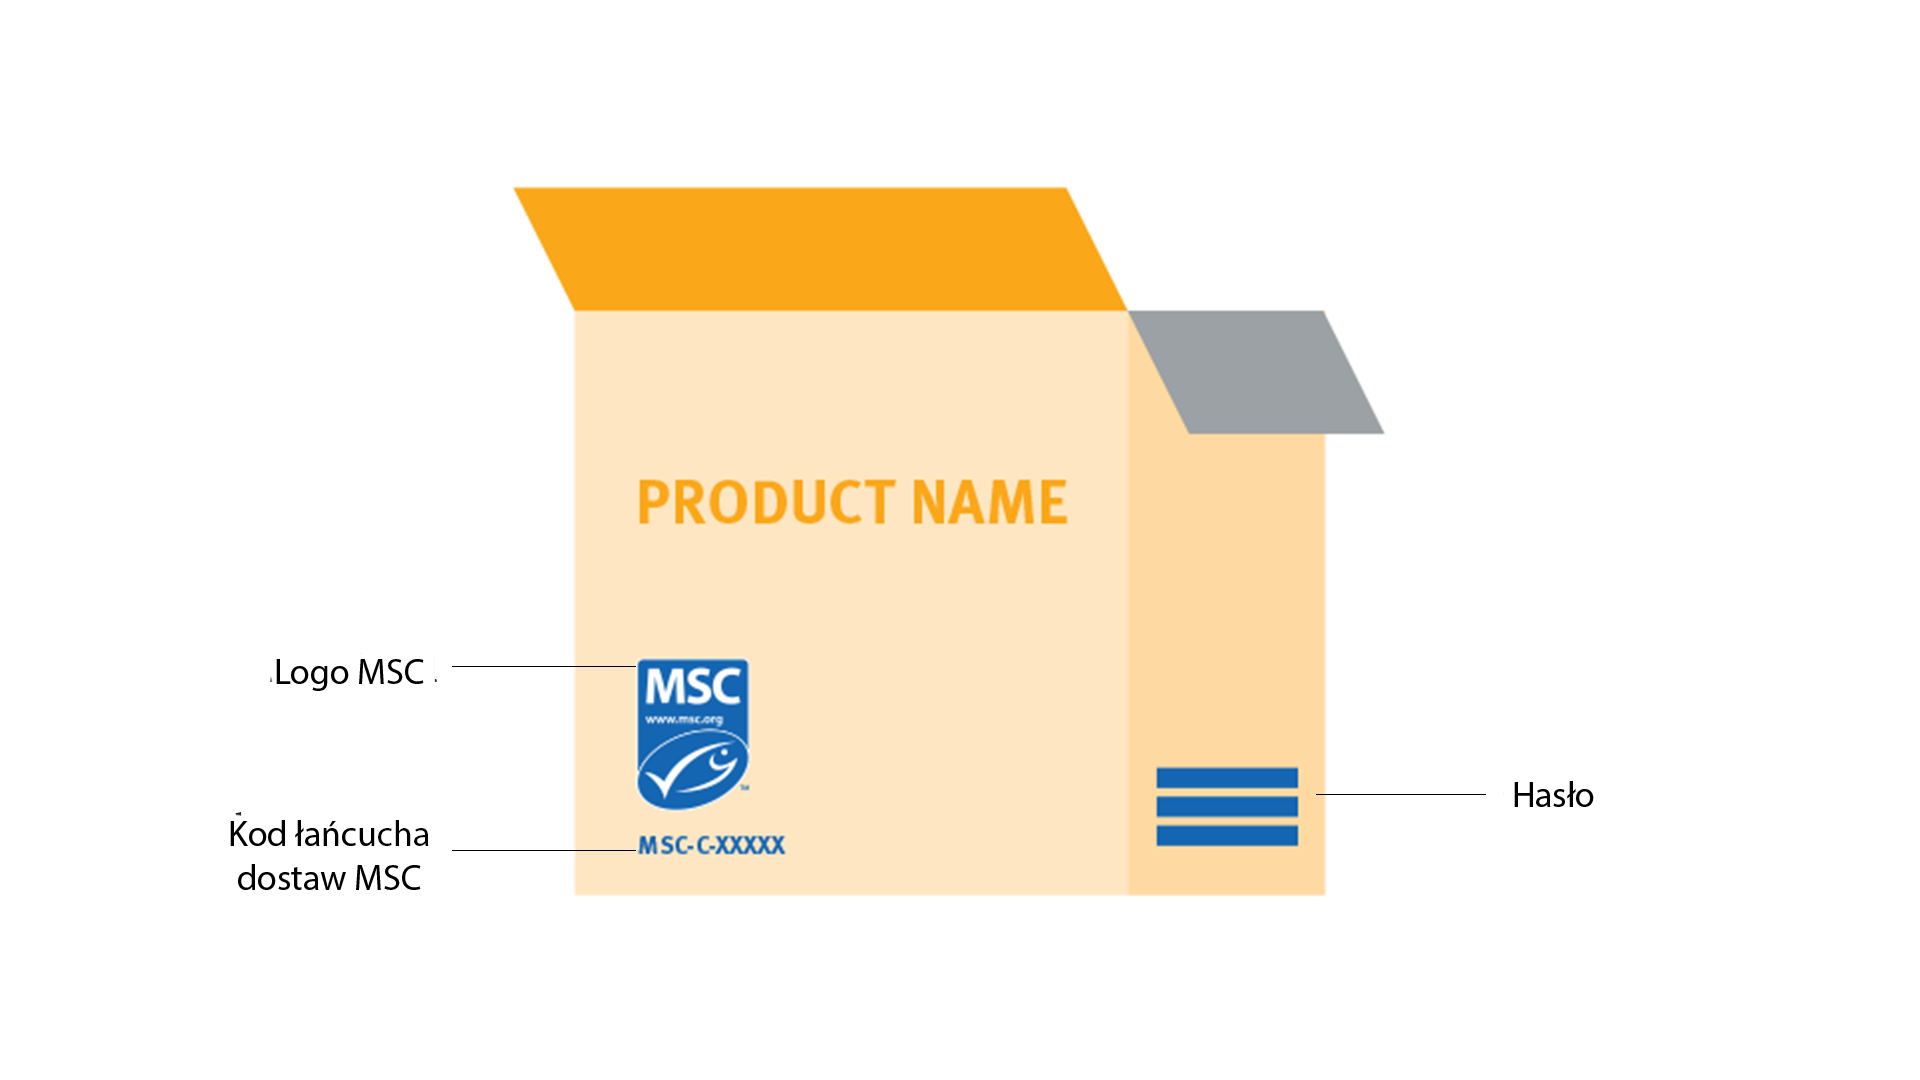 msc-label-on-product-use-JO